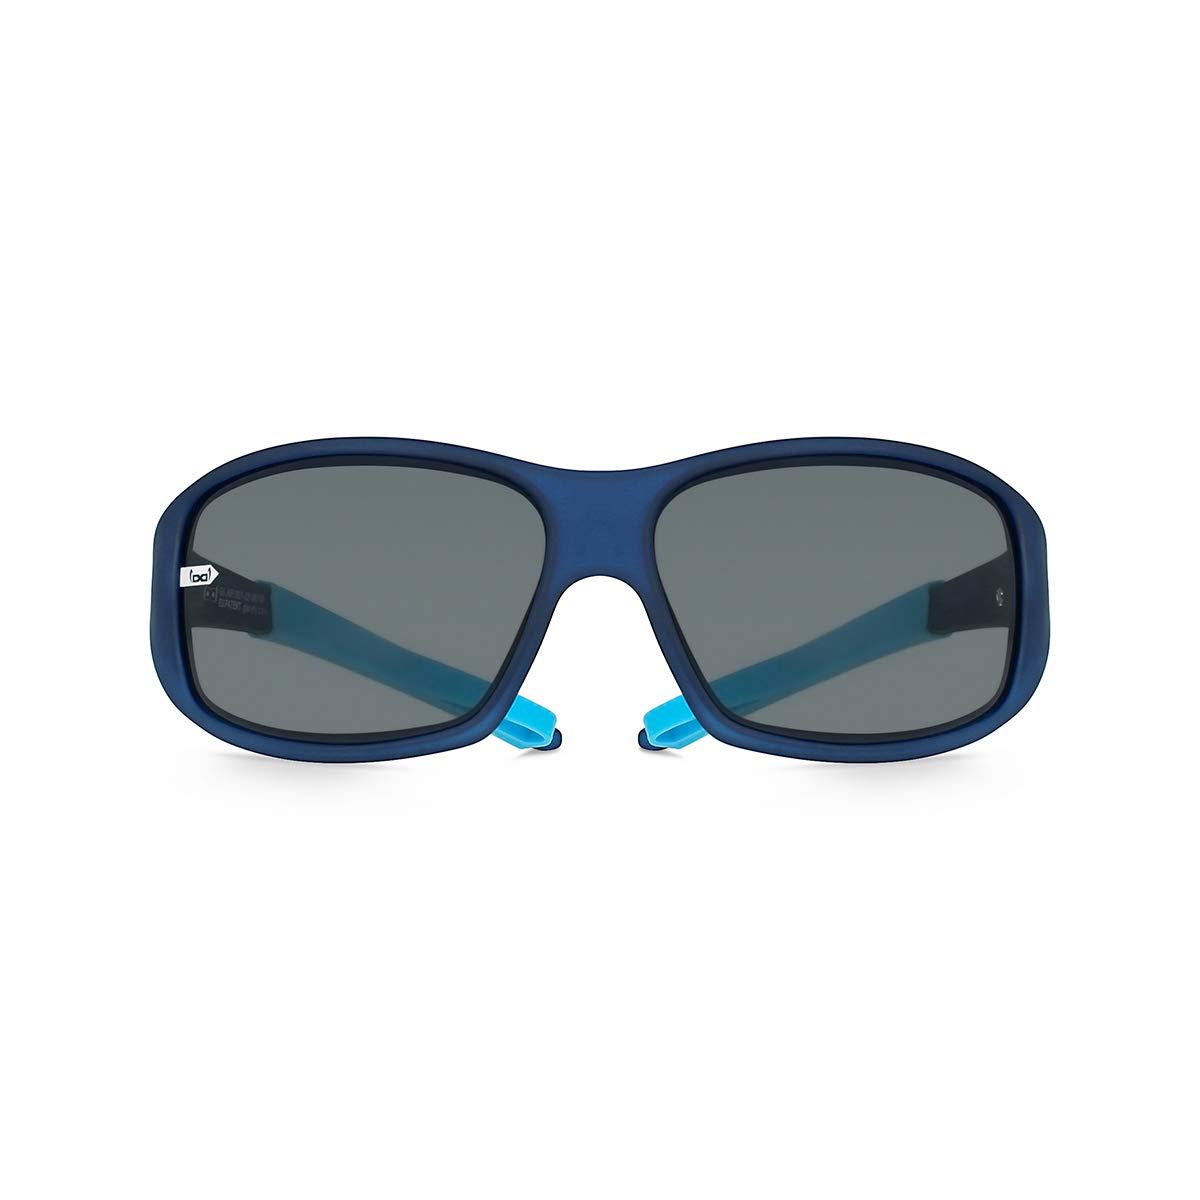 3e6386f99e72fb gloryfy unbreakable eyewear Kinder Junior Sonnenbrille blau, One Size:  Amazon.de: Sport & Freizeit